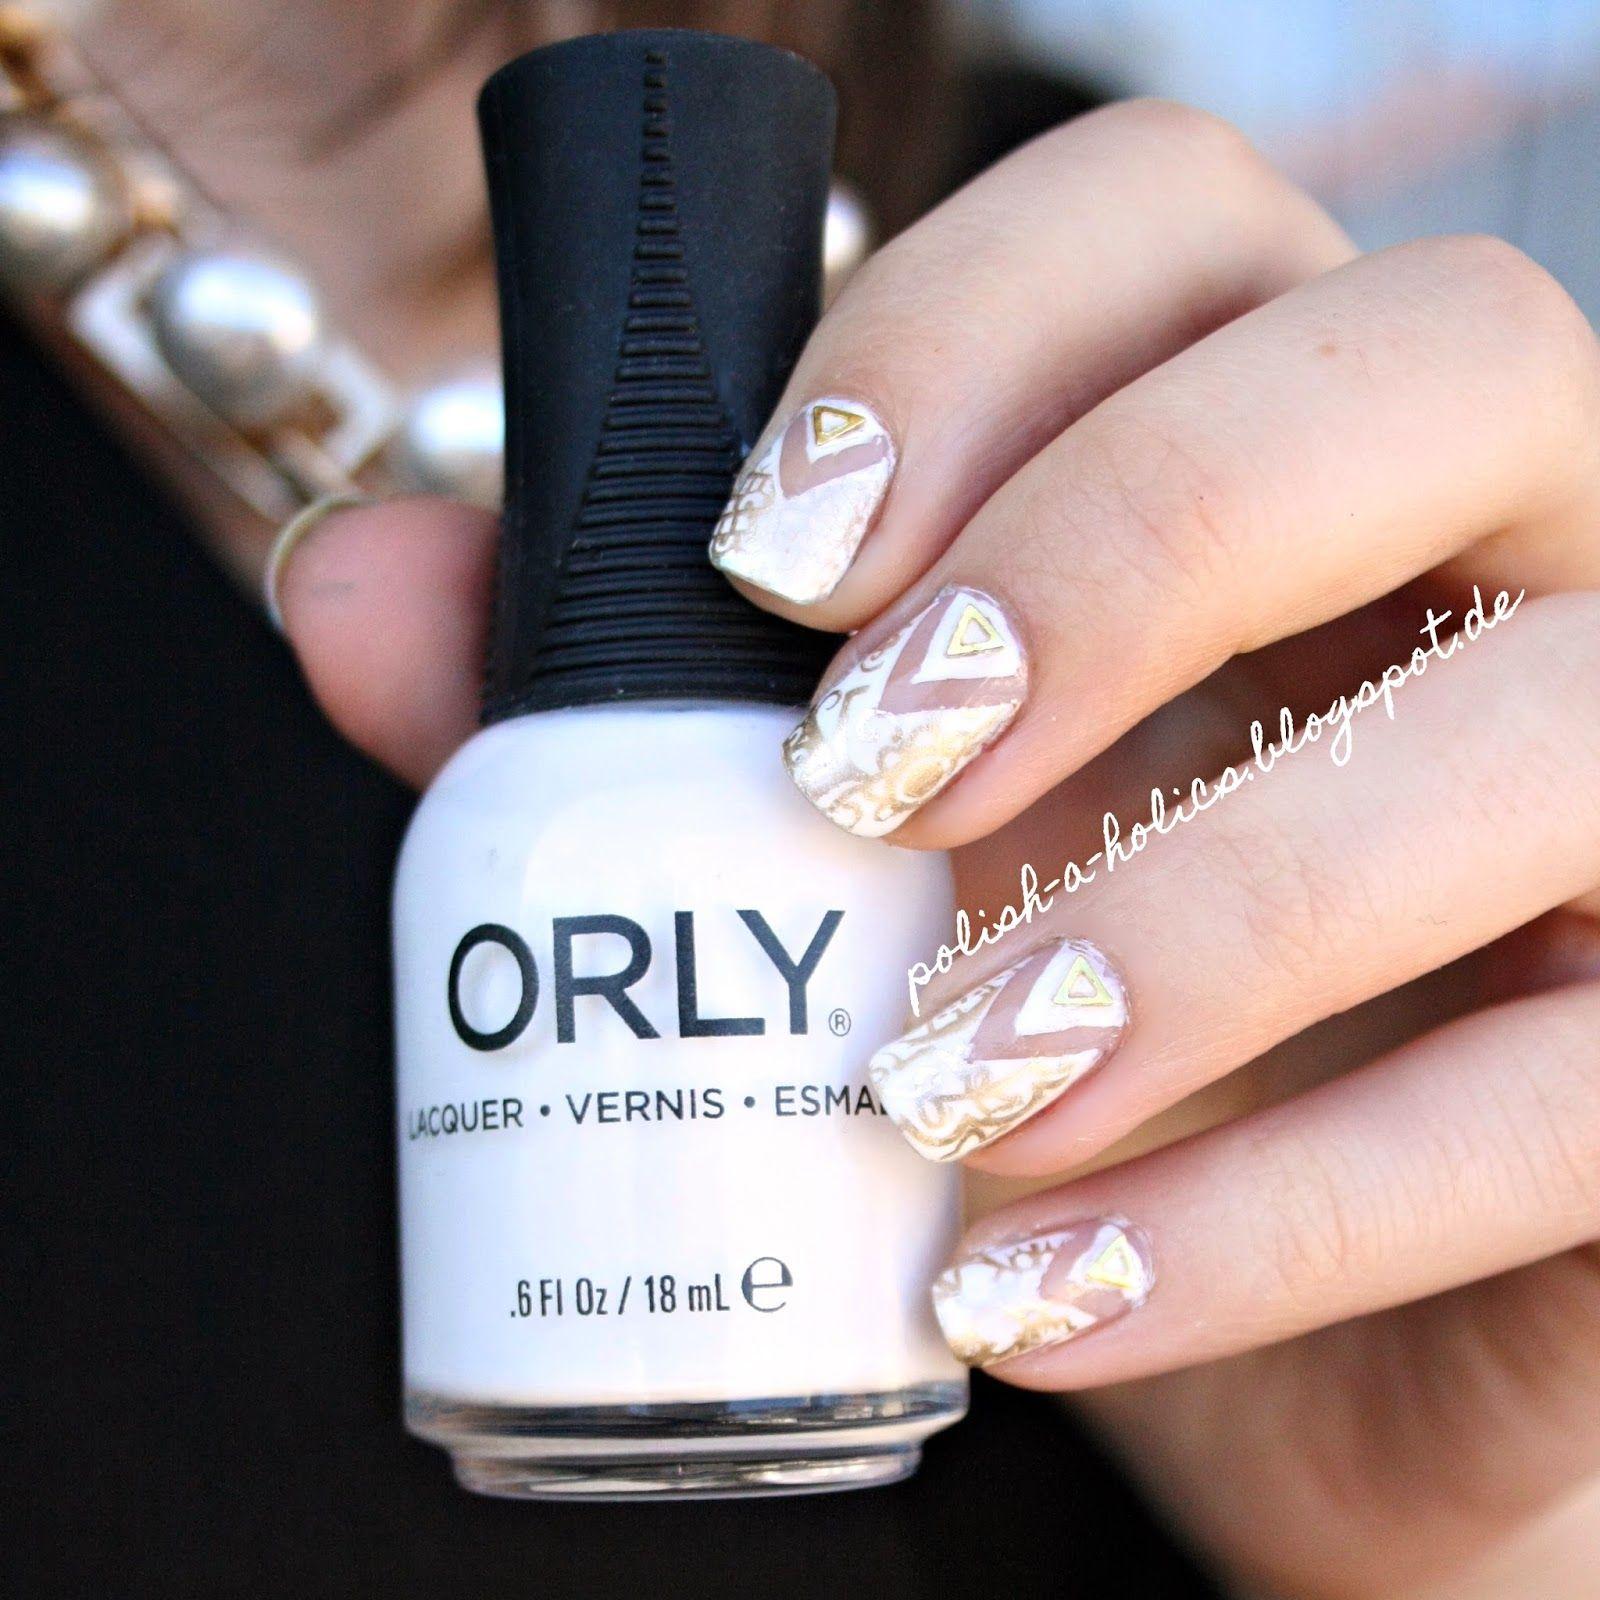 #cutout #nails #nailart #orly #white #whitenails #whiteandgold #bornprettystore #zara #zaranecklace